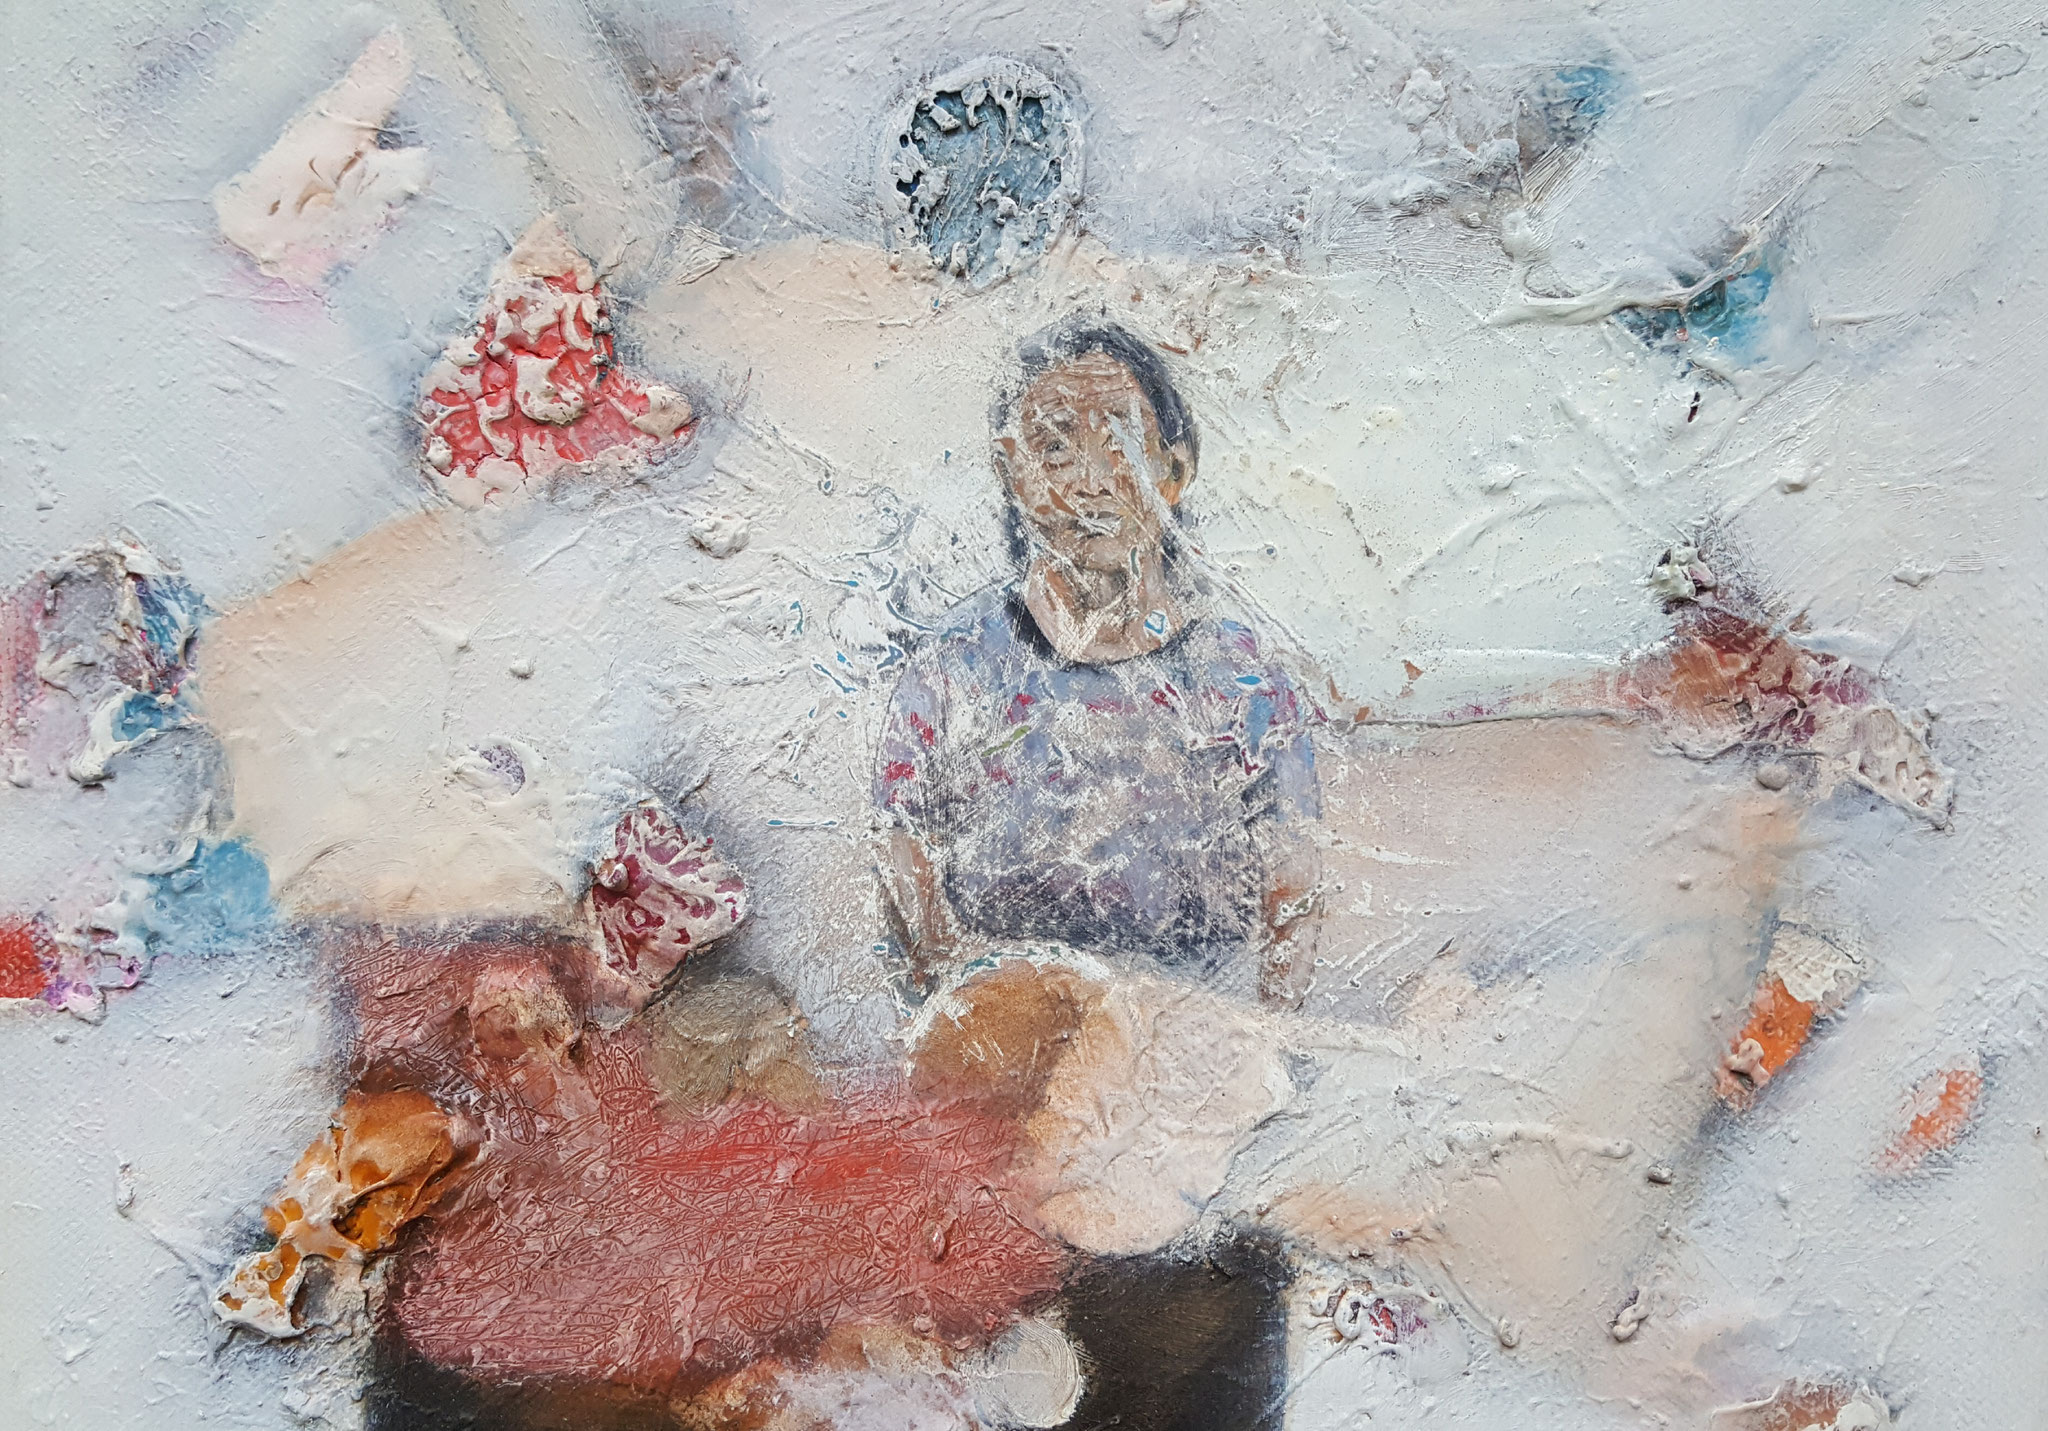 Des-aparecidos III, 2018, 30 x 24 cm, Técnica mixta sobre lienzo